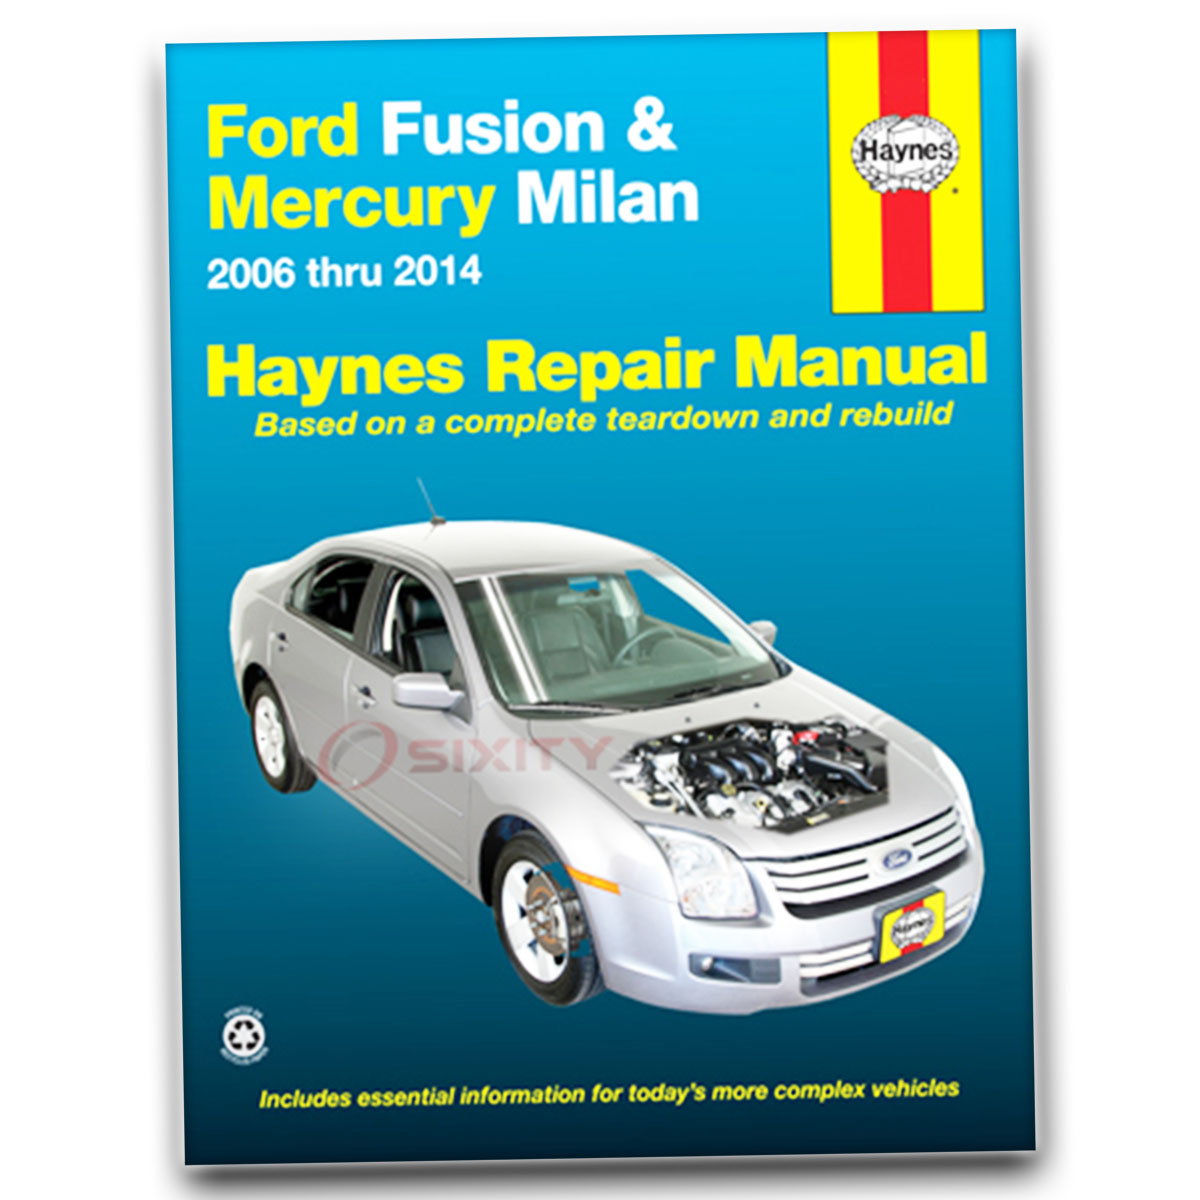 ford fusion haynes repair manual s sport sel hybrid shop service rh ebay com ford fusion repair manual 2013 ford fusion repair manual